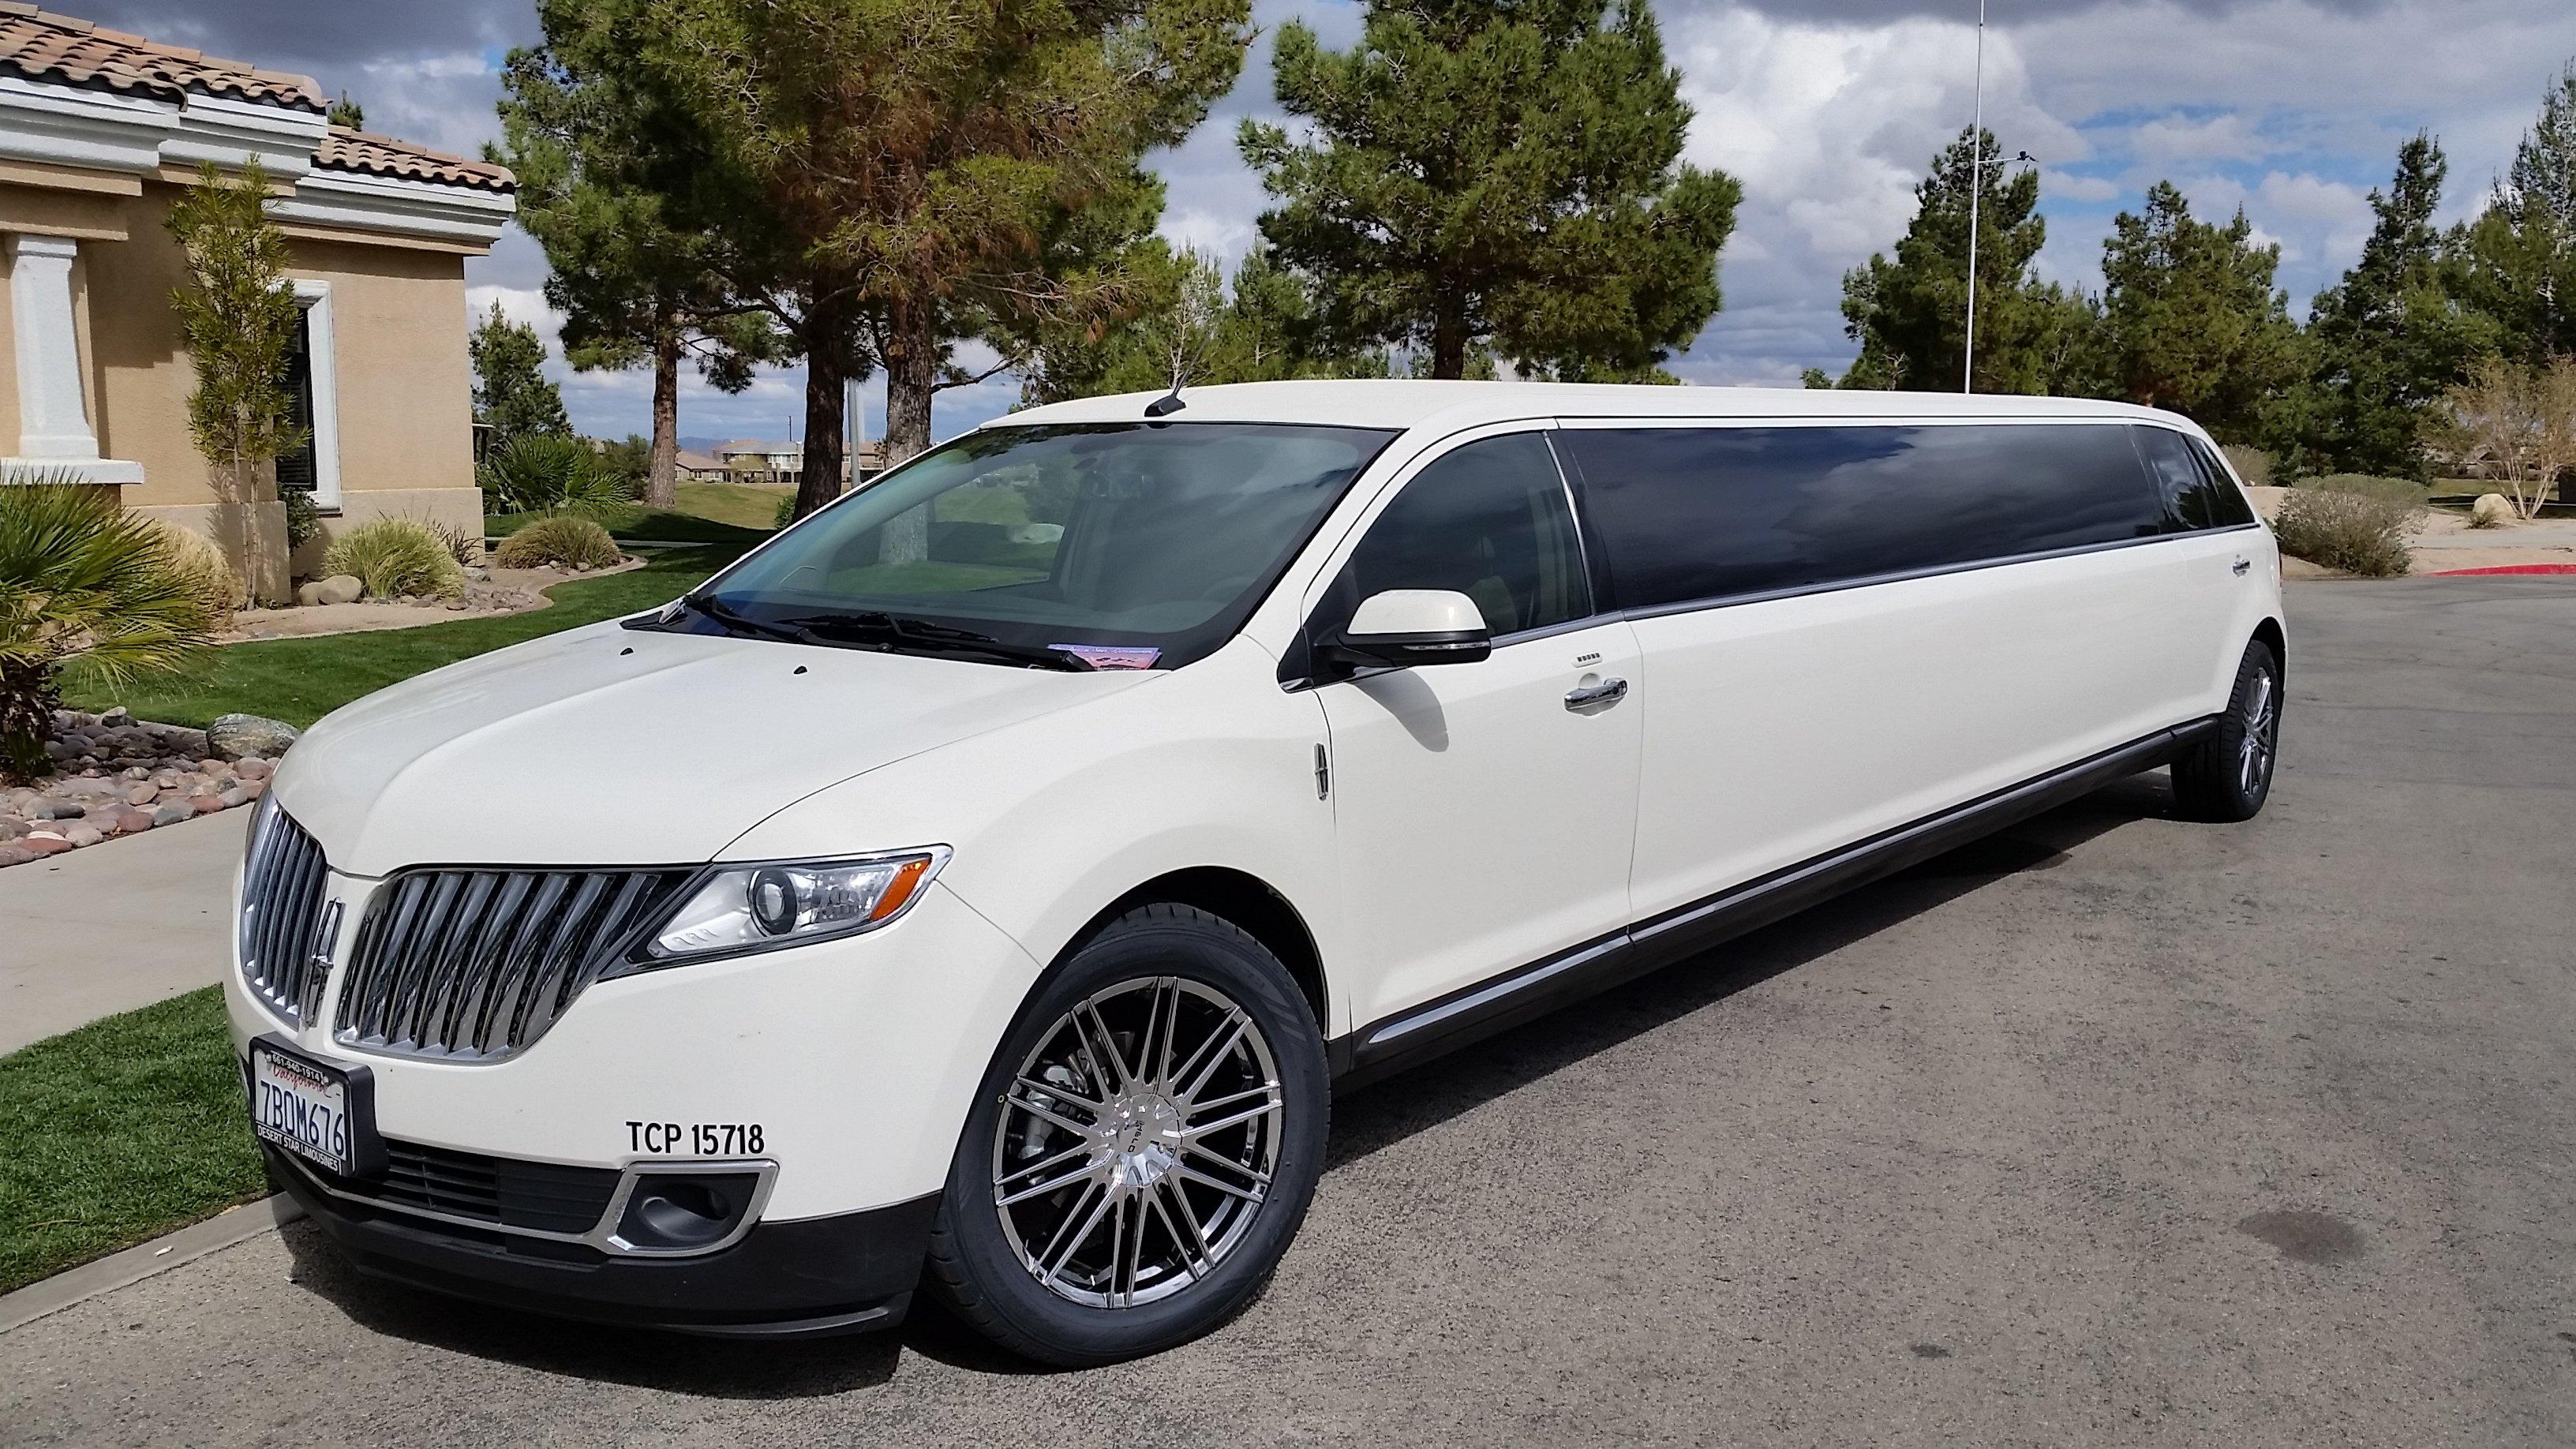 Pearl White Lincoln MKX 12 Passenger Limousine